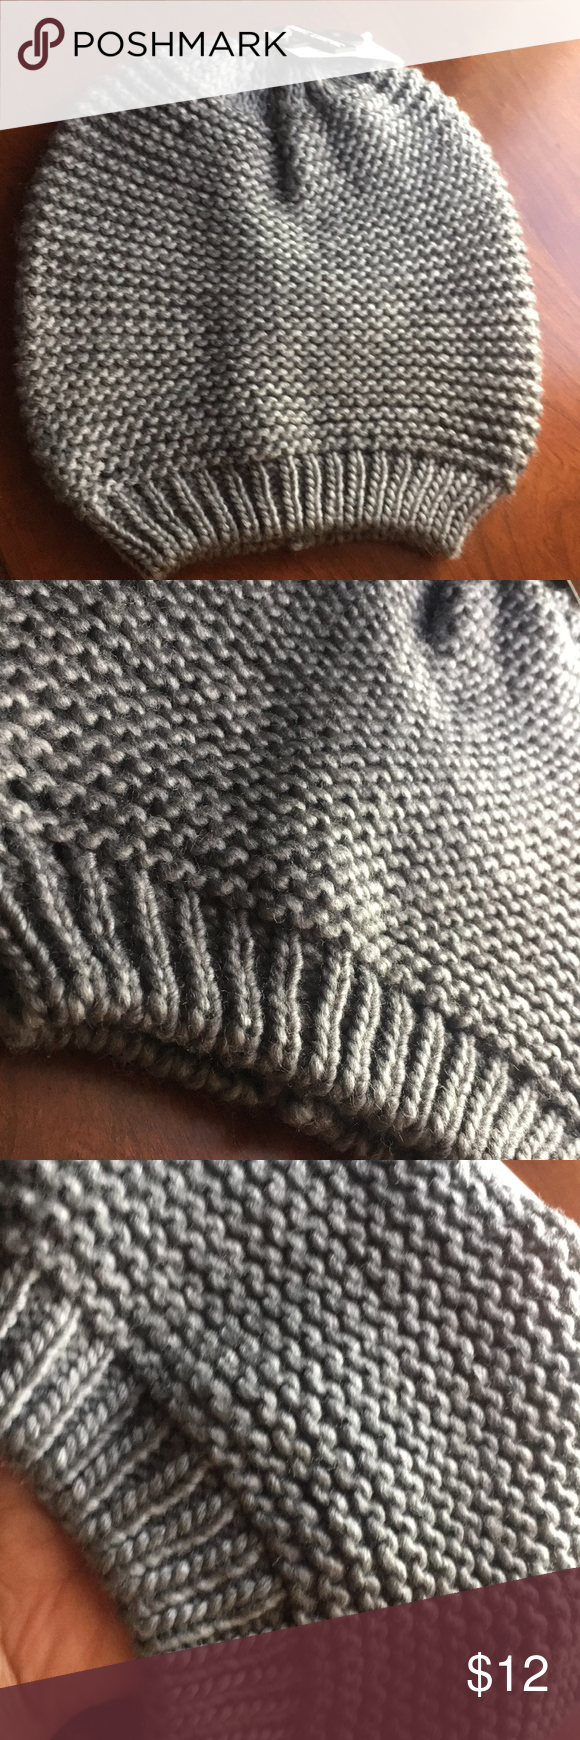 NWT gray unisex beanie NWT Clothes design, Unisex, Women